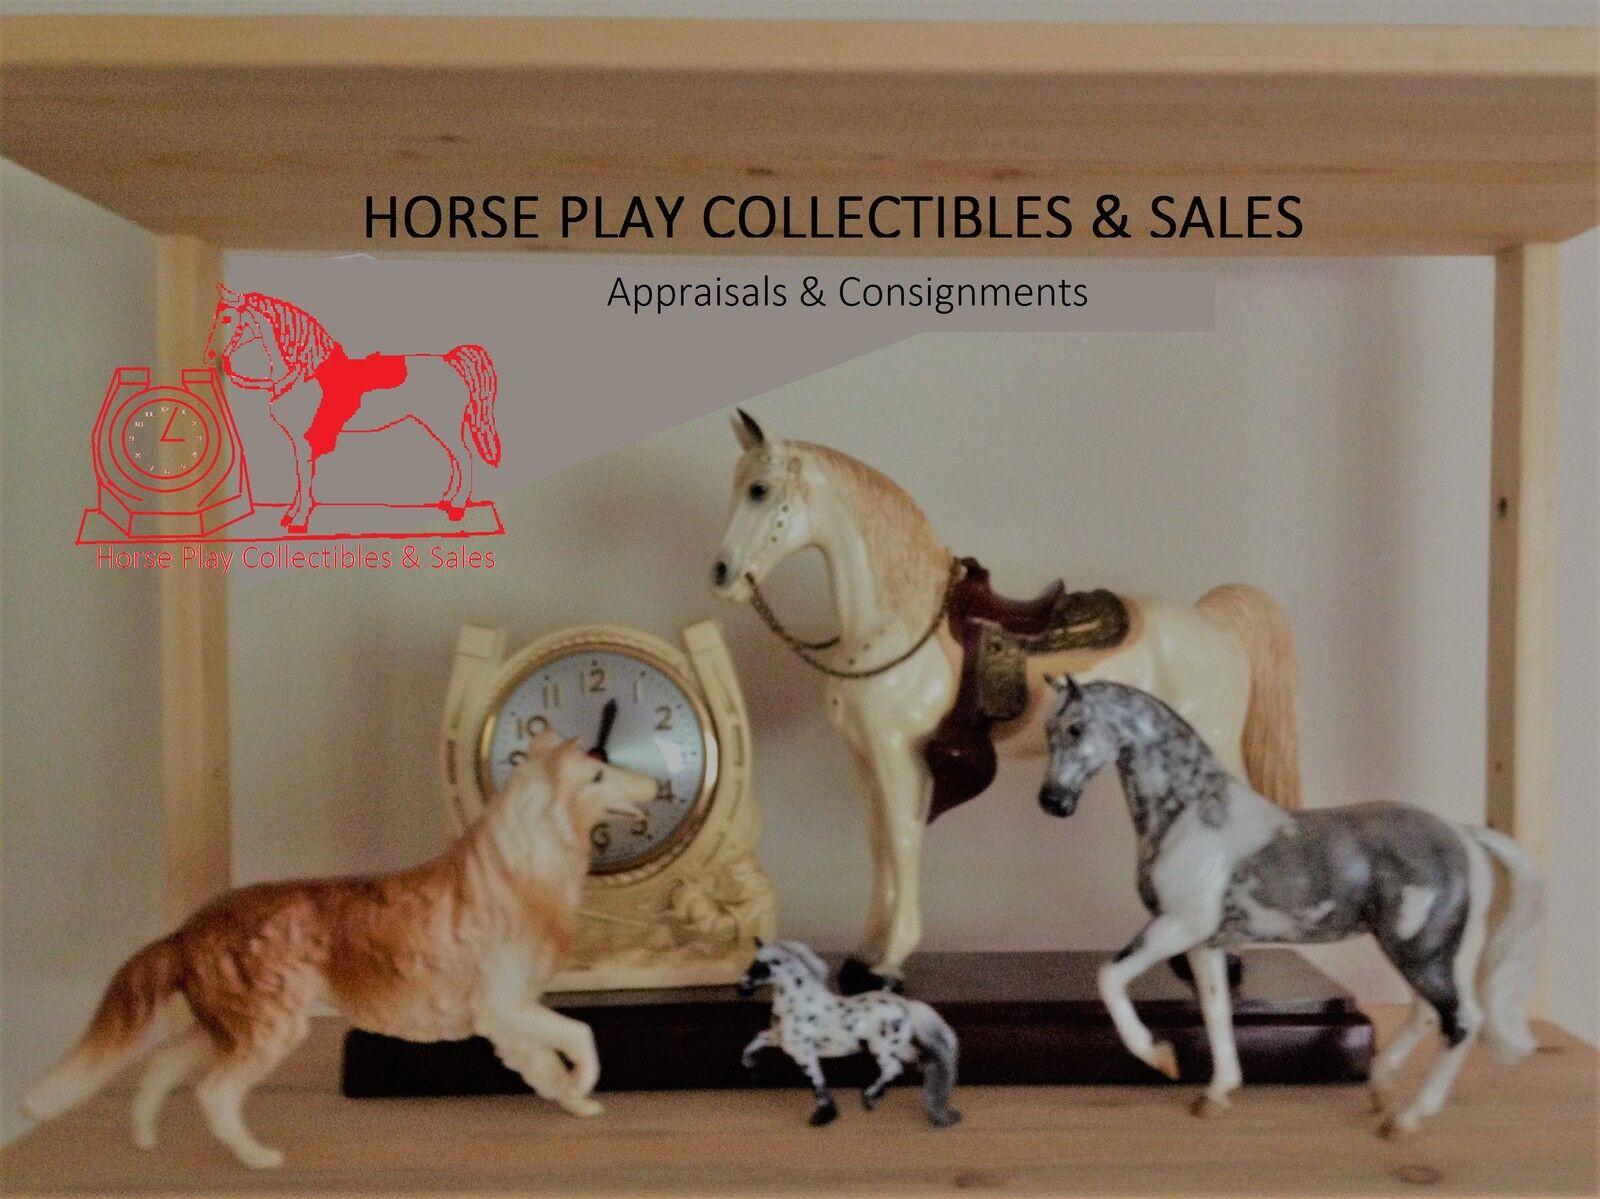 Horse Play Collectibles